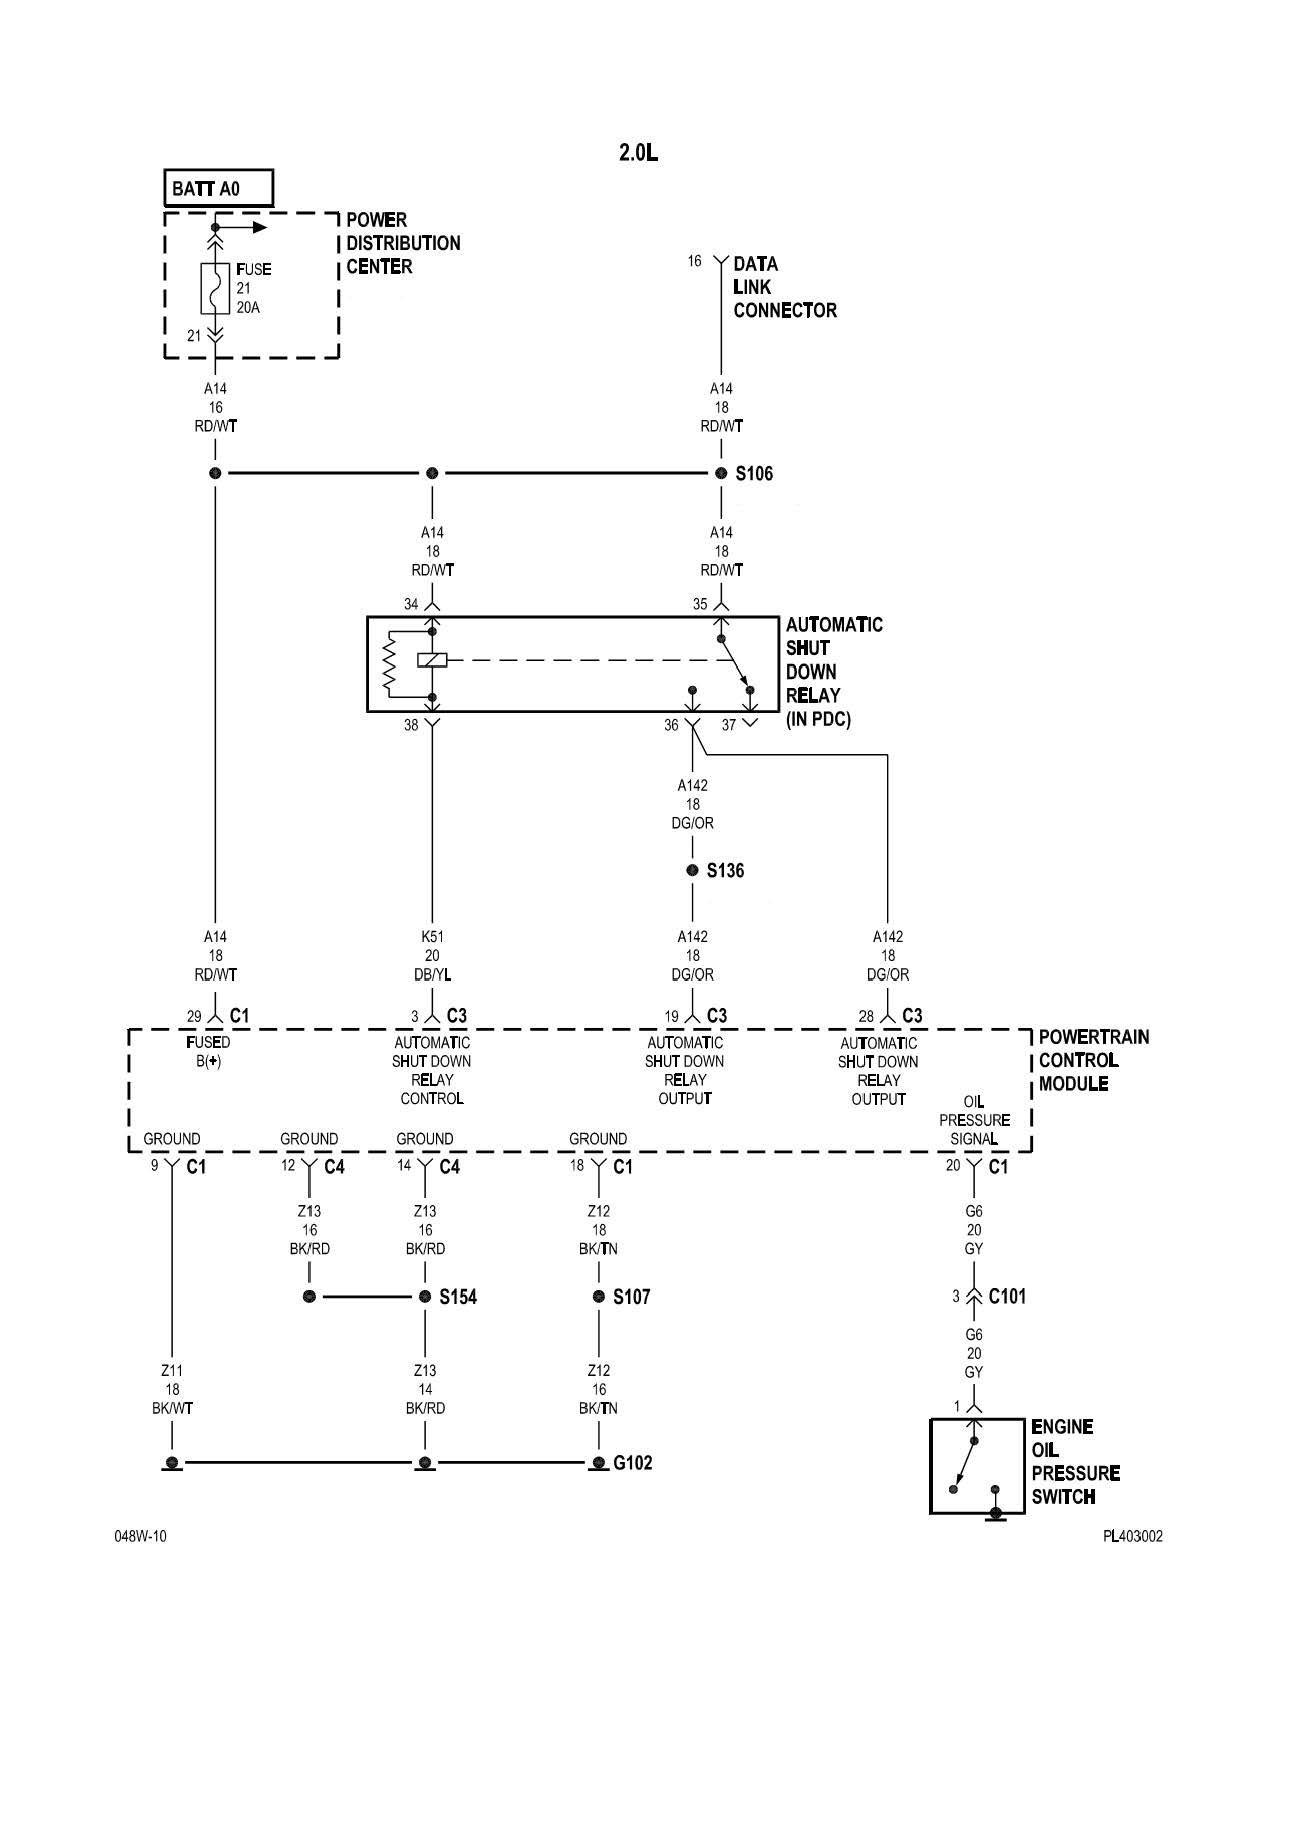 [DIAGRAM_5UK]  DE_6786] Dodge Pcm Circuit Wiring Diagram Wiring Diagram | Dodge Neon Ignition Wiring |  | Syny Knie Dict Vira Mohammedshrine Librar Wiring 101